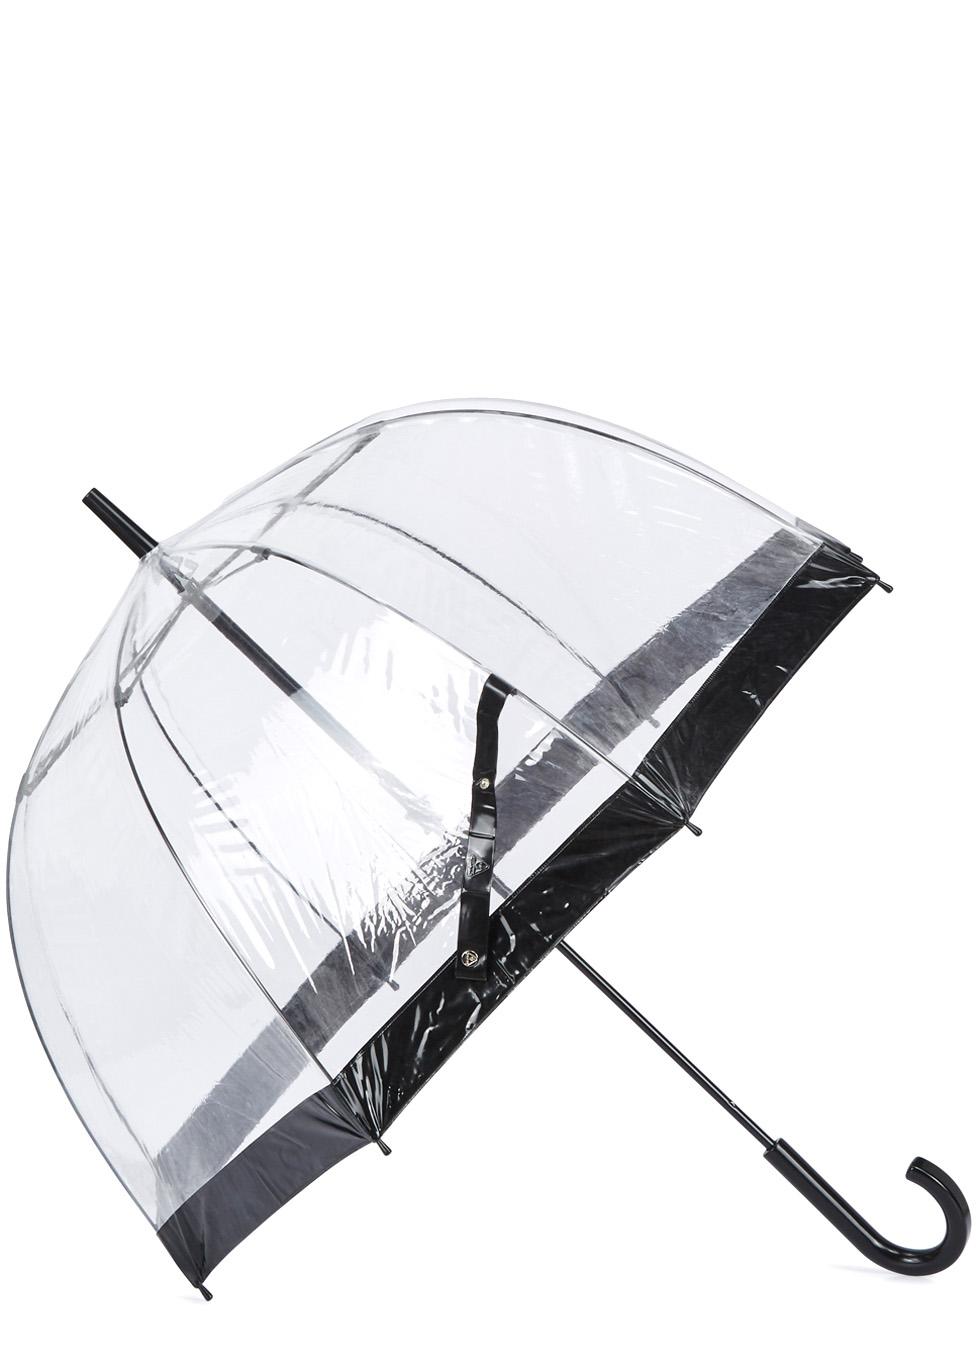 Birdcage domed umbrella - Fulton